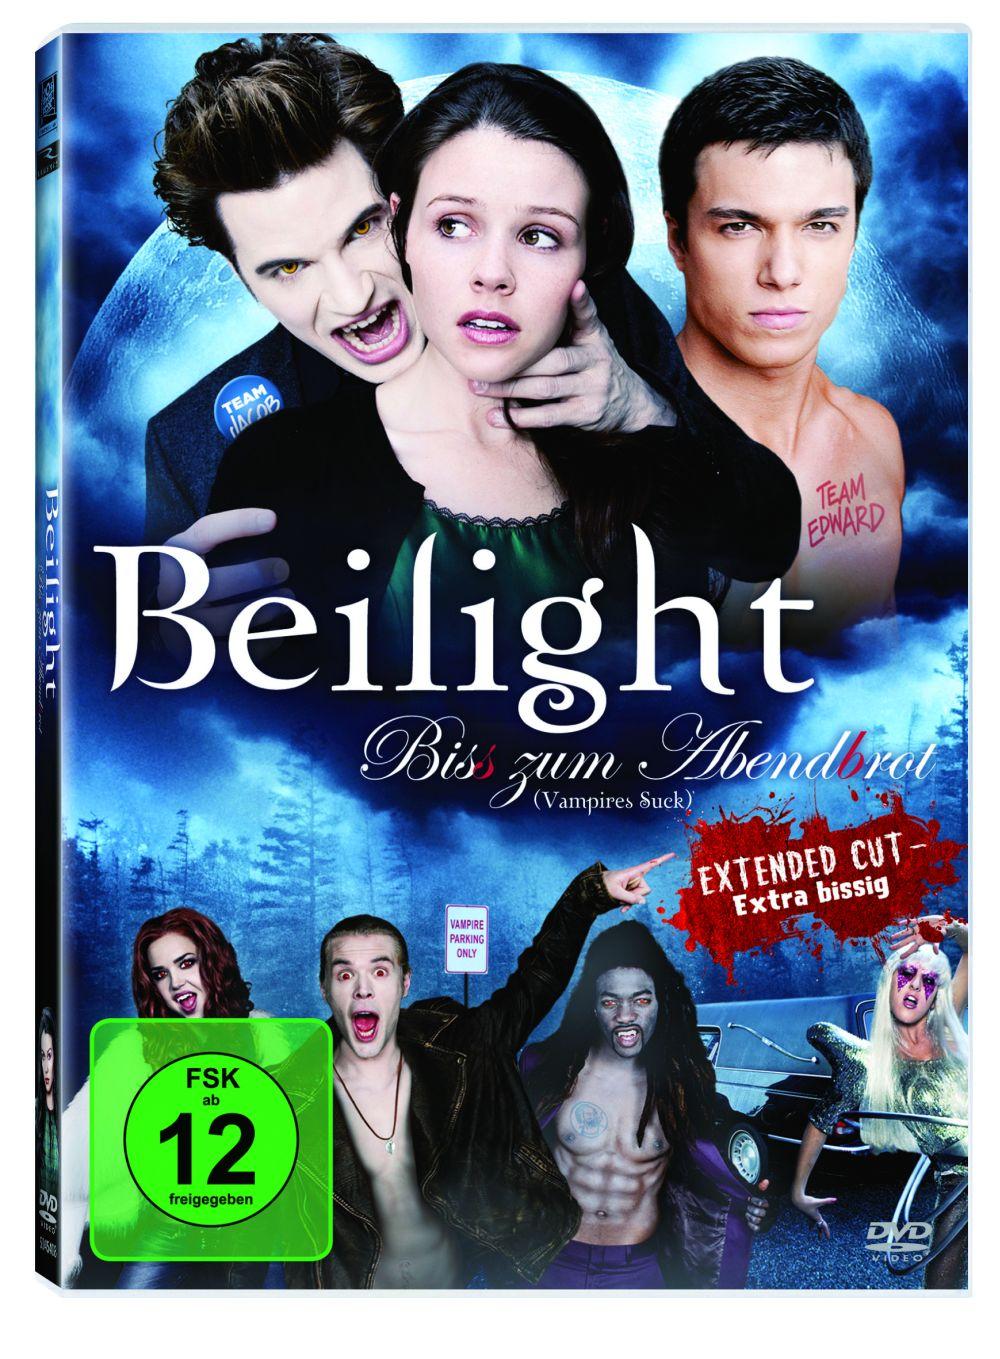 Beilight